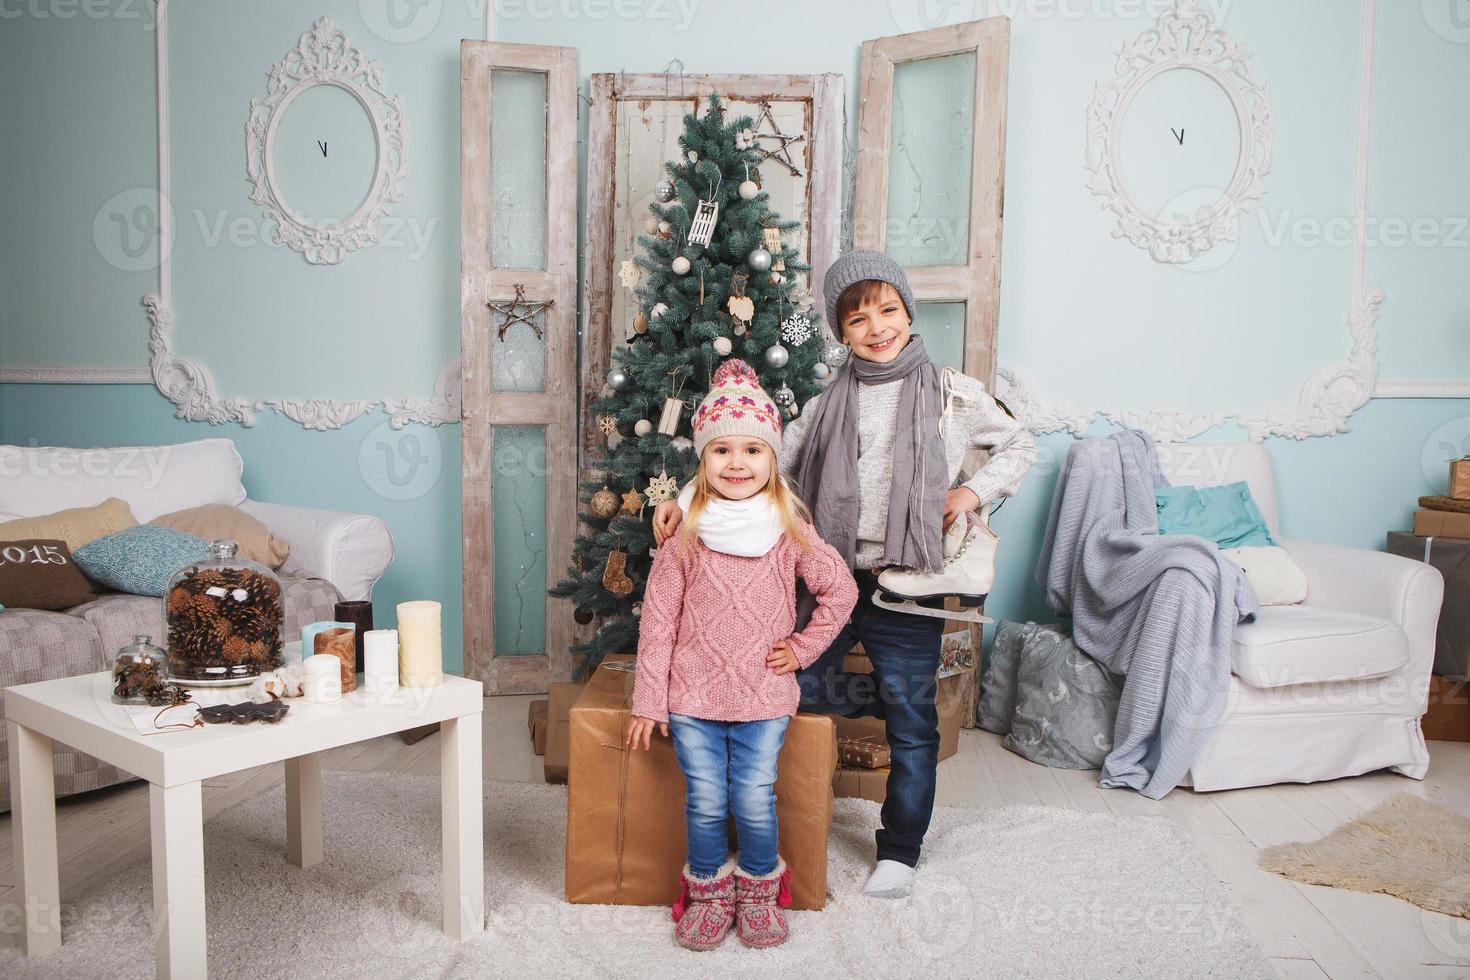 humeur de Noël photo